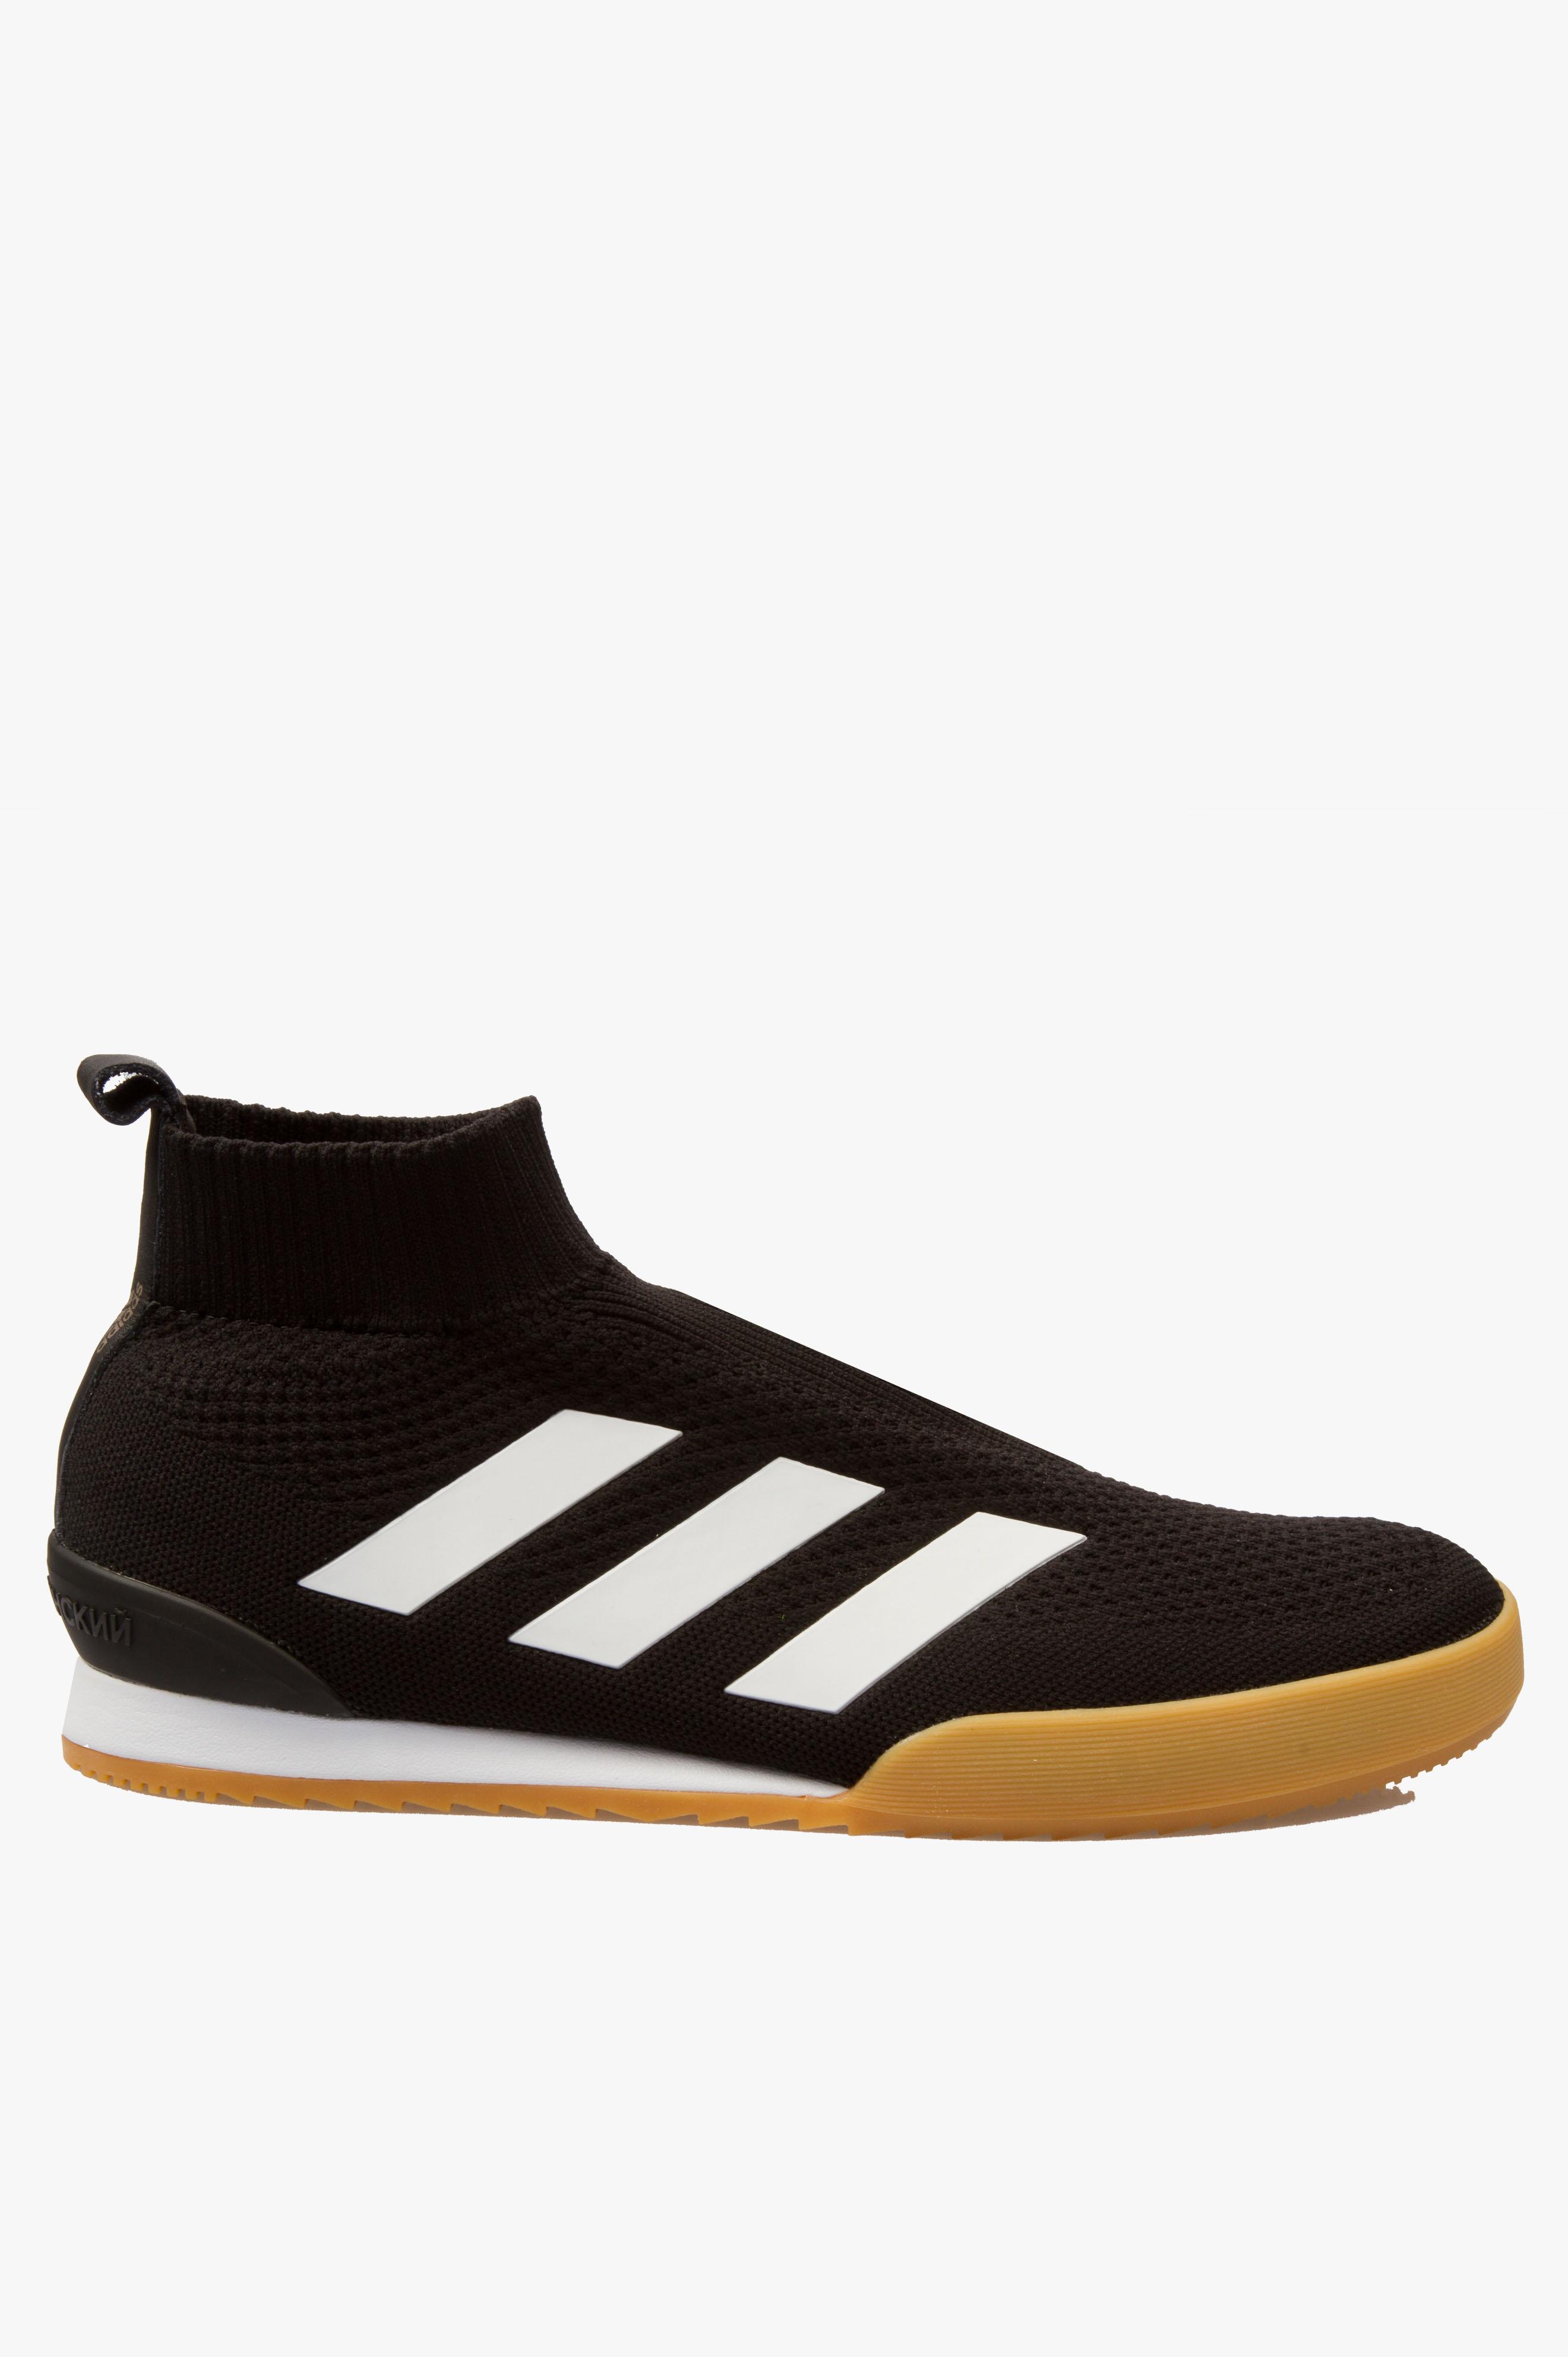 x Adidas Ace 16+ SUPER Sneaker Black